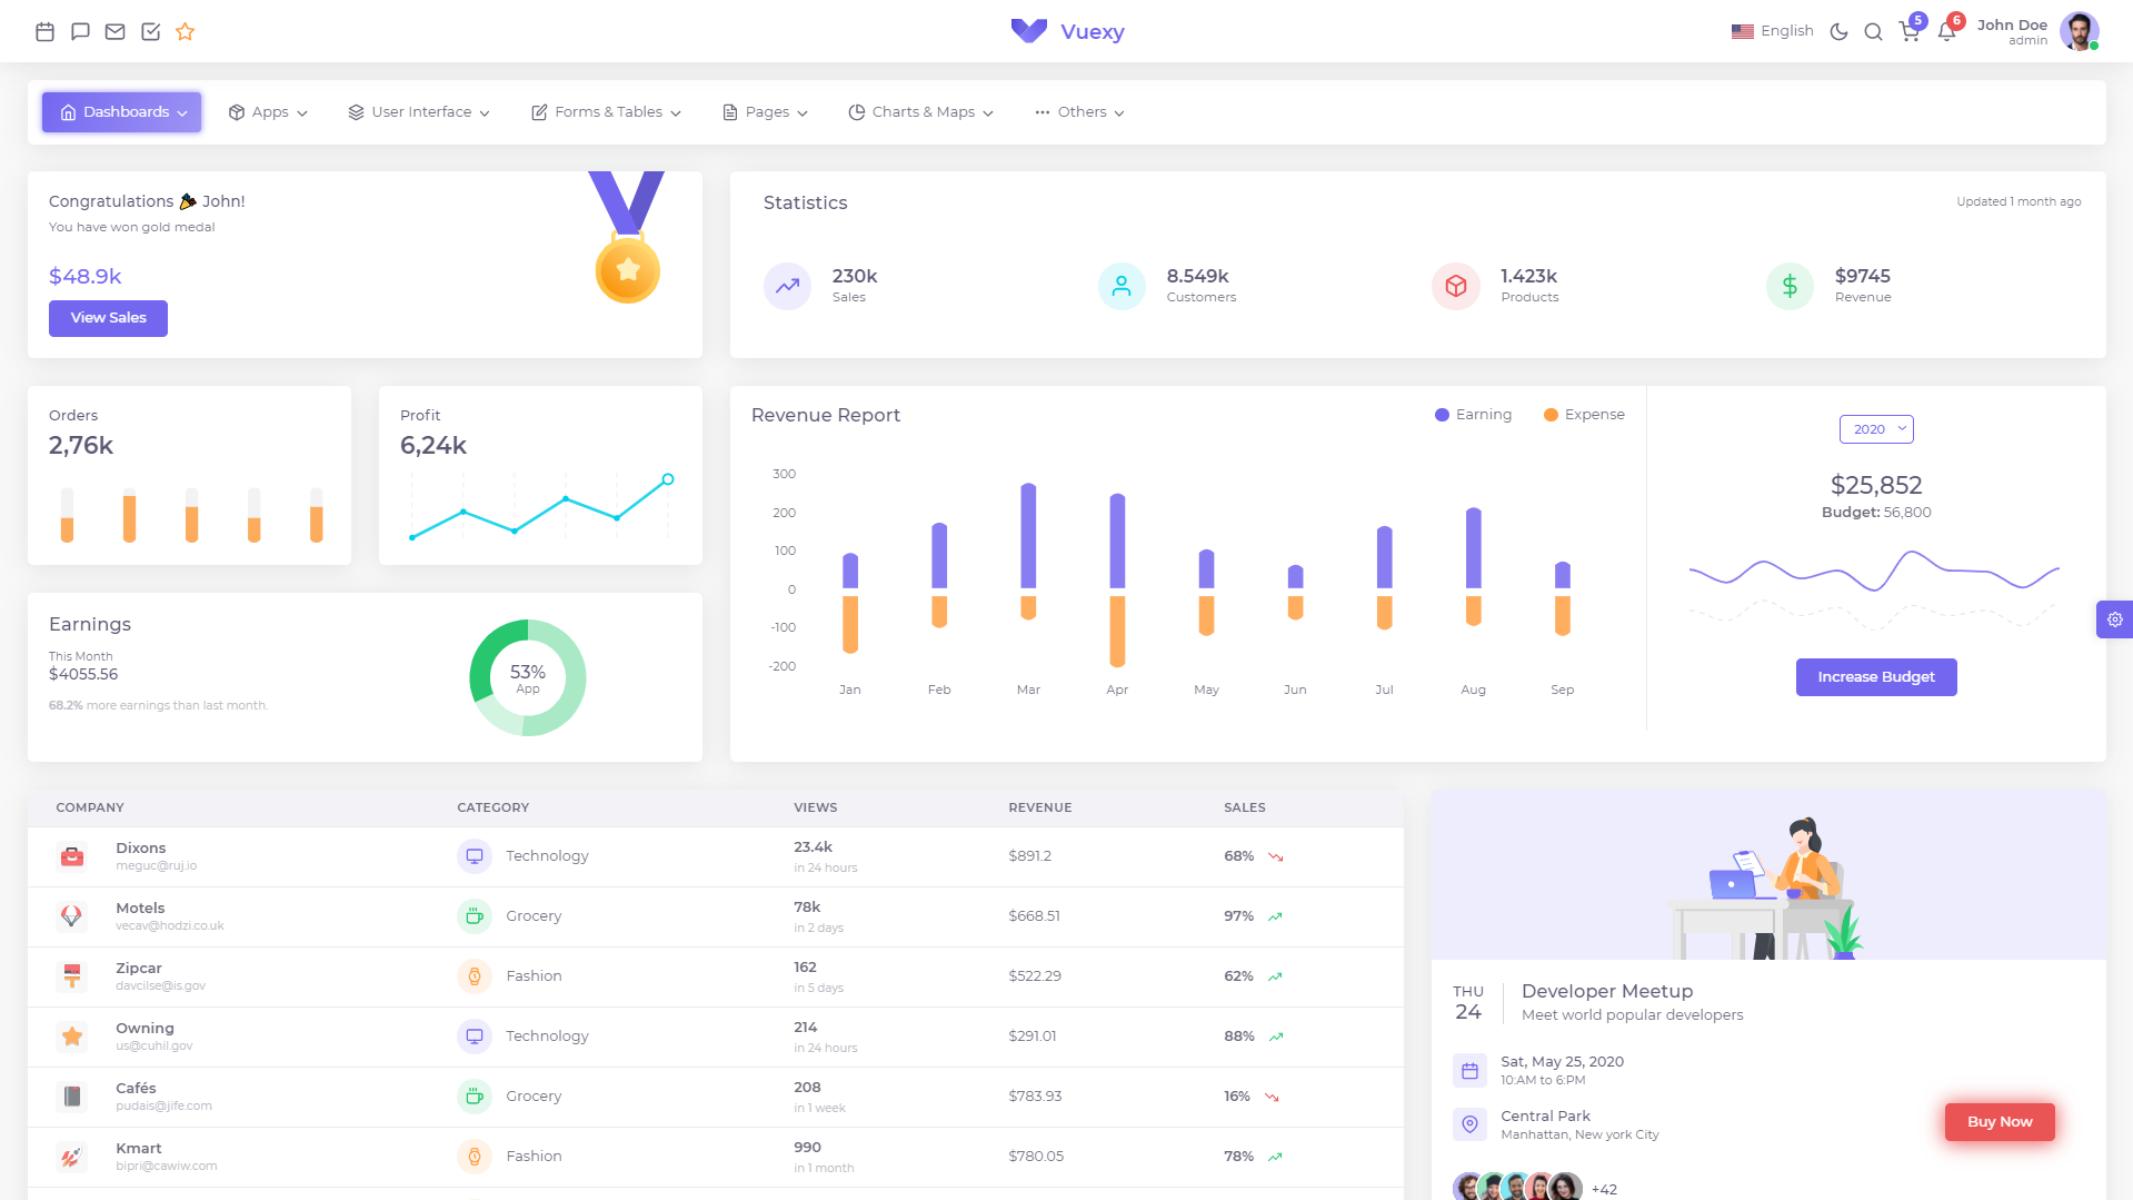 Vuexy-Vuejs Horizontal Menu Admin Template Free